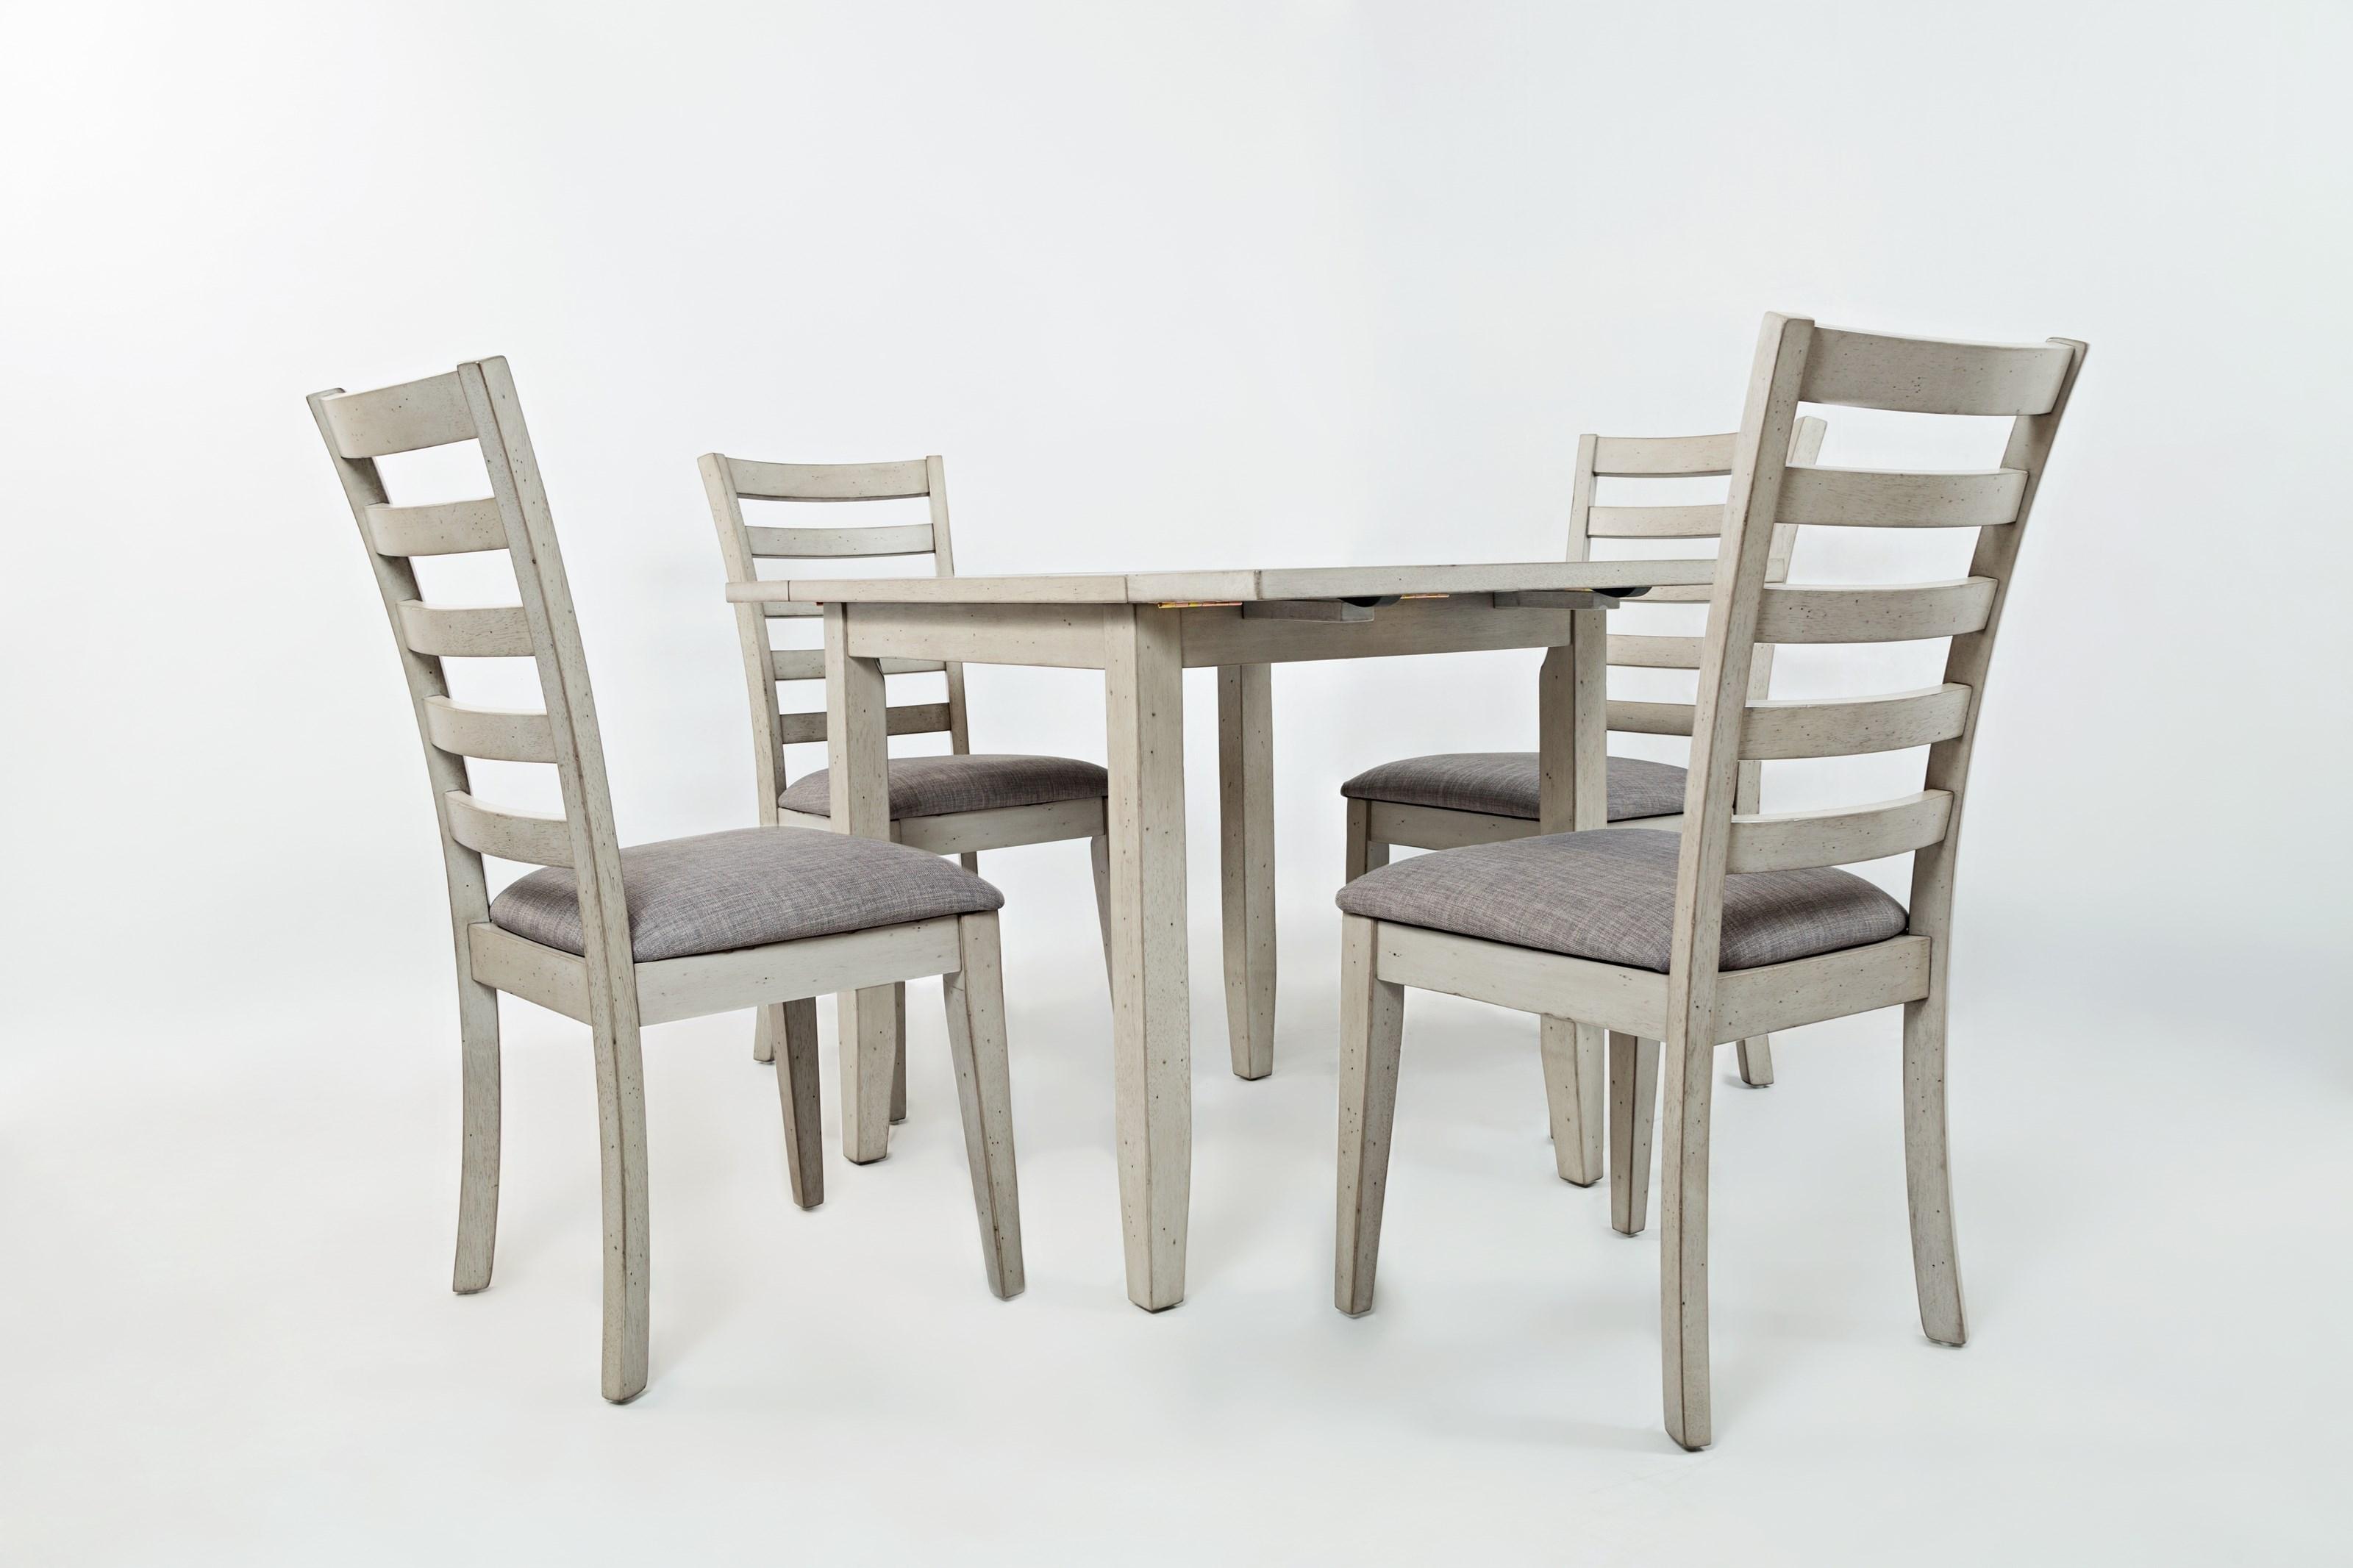 Sarasota Springs Drop-Leaf Table and 4 Chair Set by Jofran at Jofran